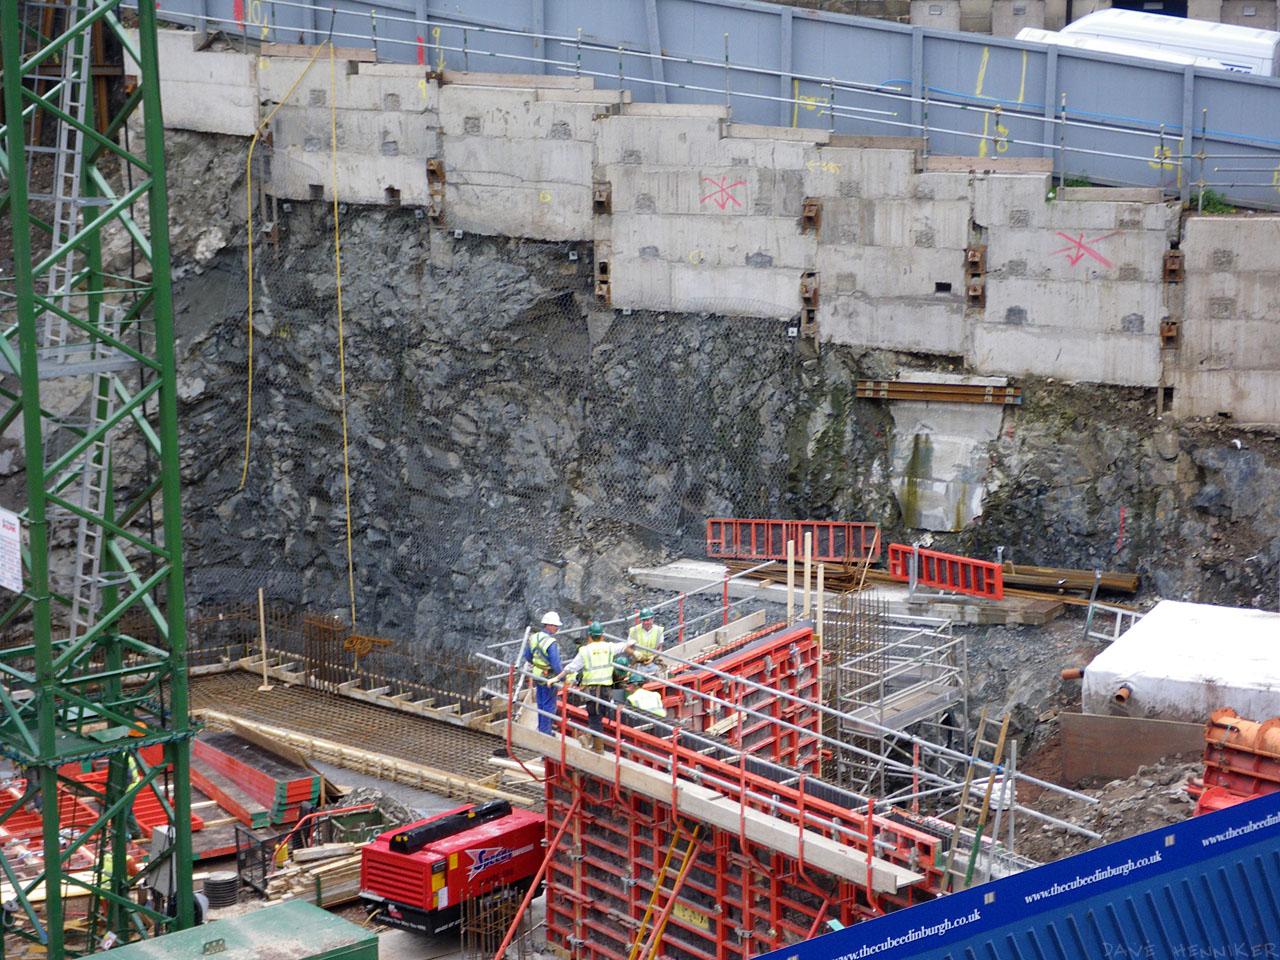 Reinforced concrete slabs prop up this part of Calton Hill.